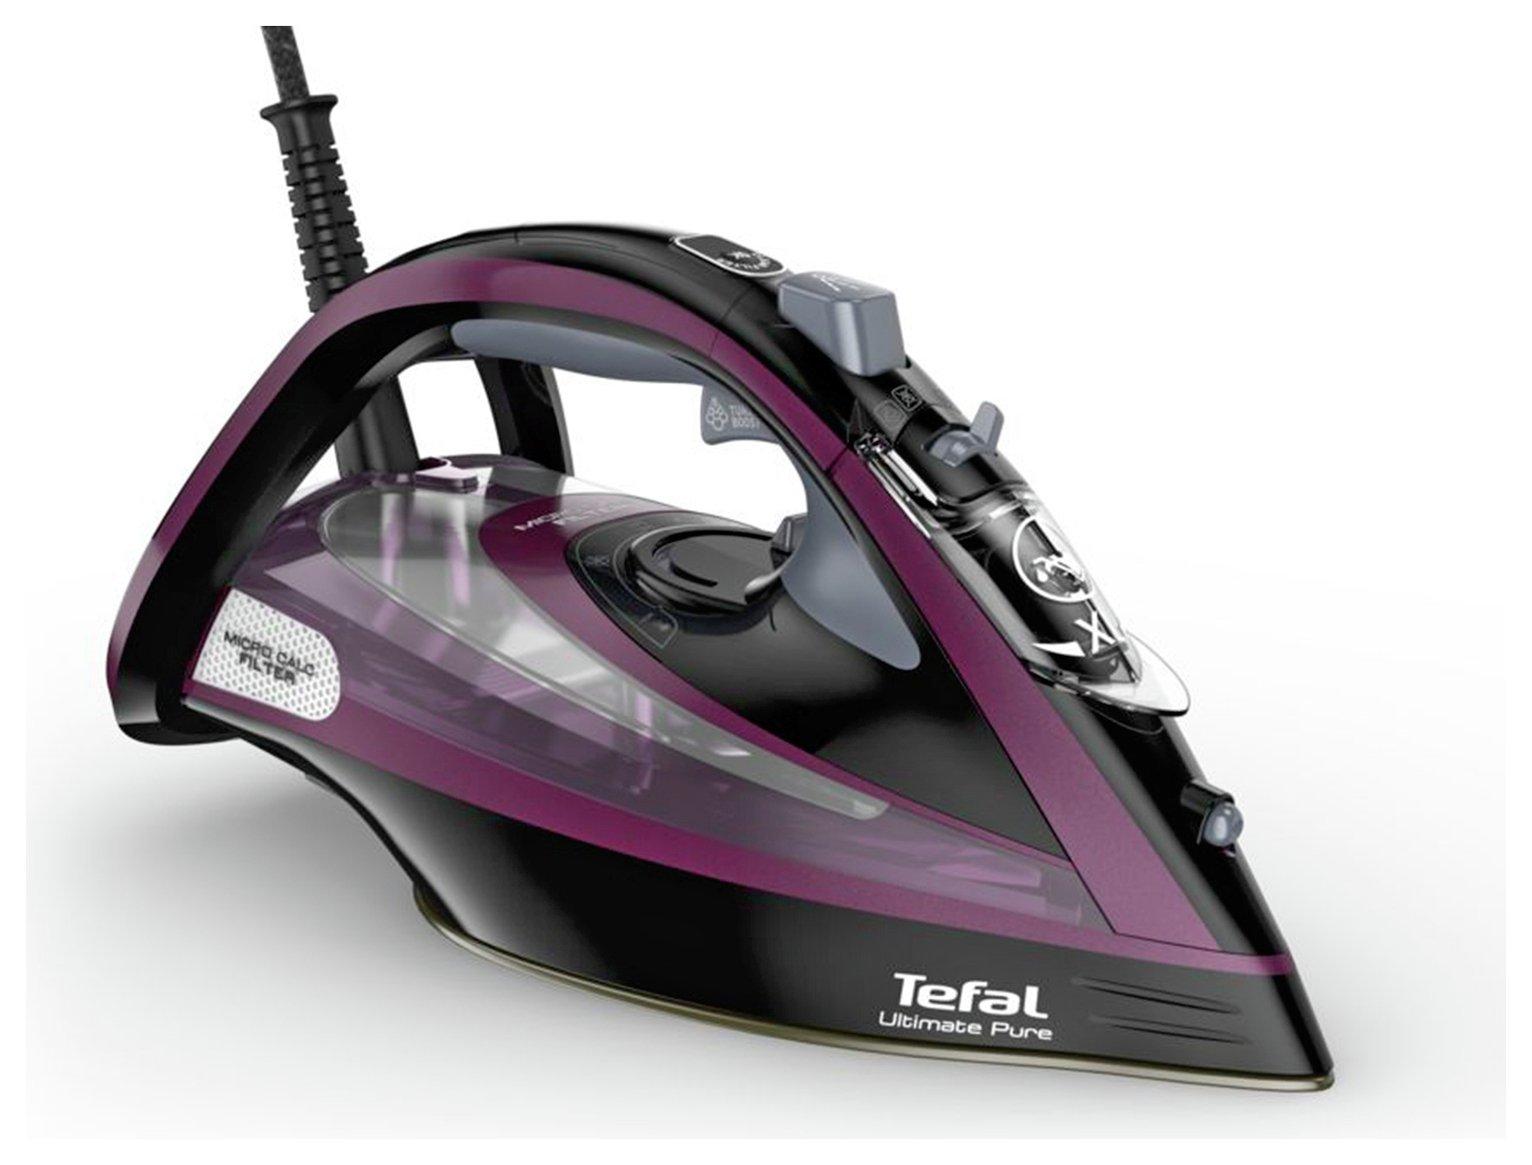 Tefal Ultimate FV9835 Steam Iron